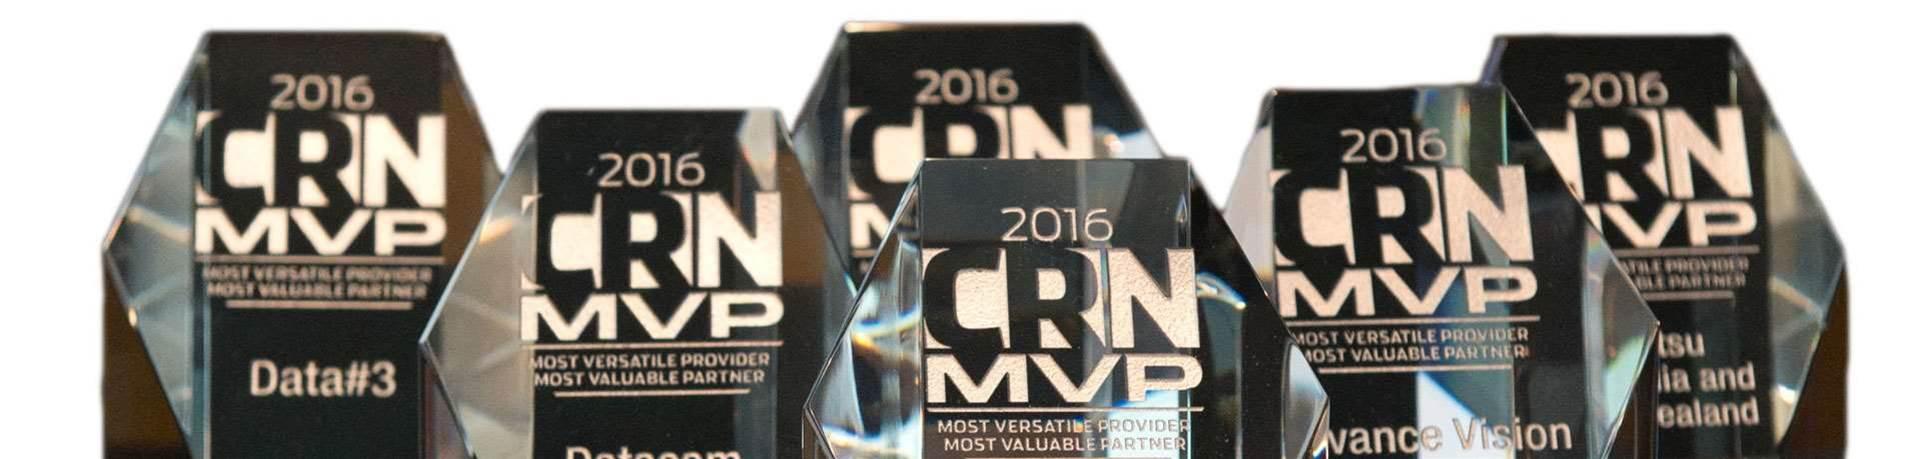 The CRN MVPs